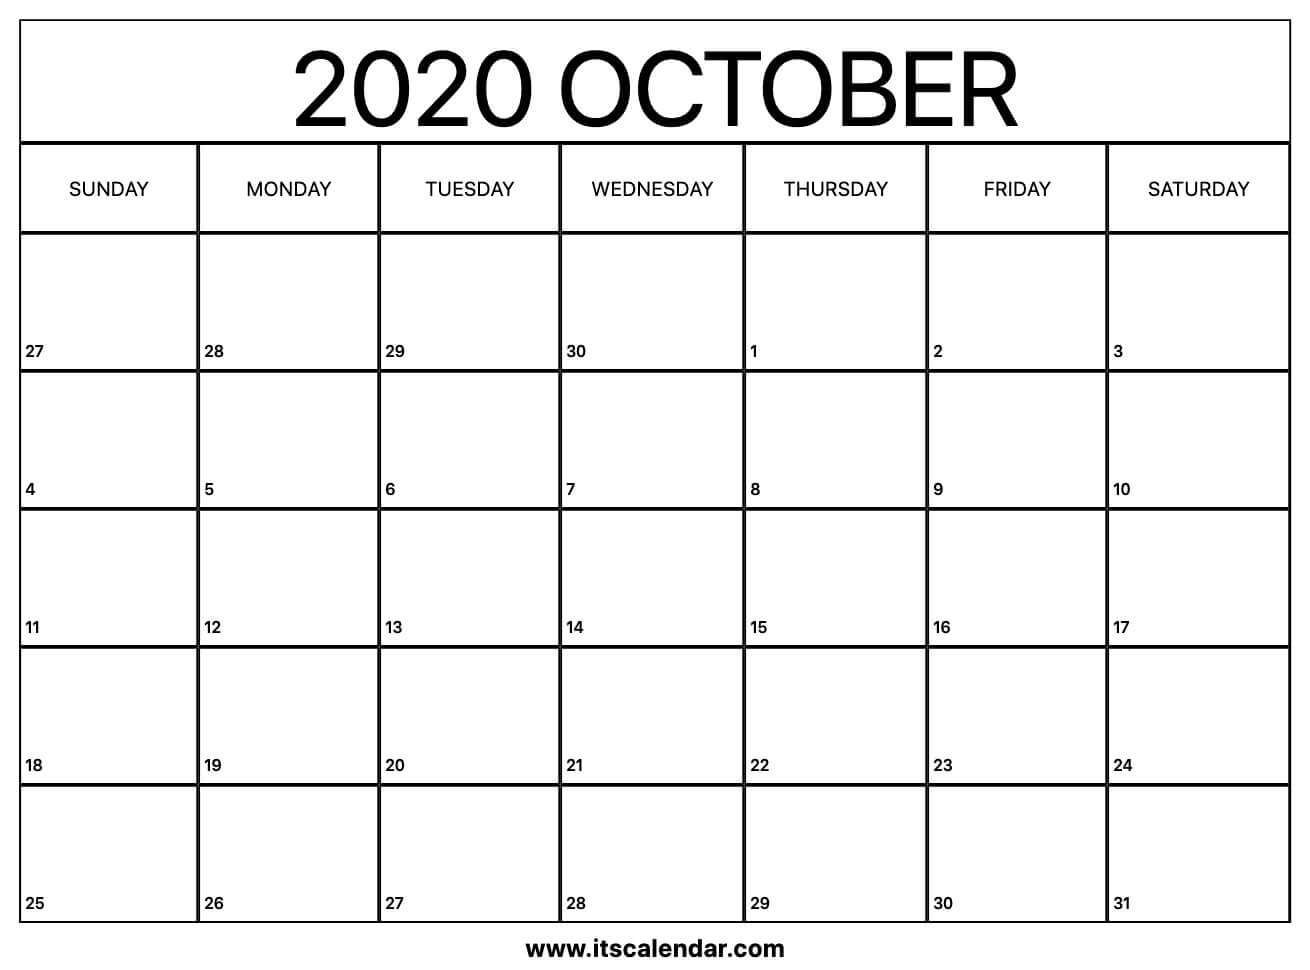 Free Printable October 2020 Calendar regarding Small Monthly Calendar Printable 2020 October